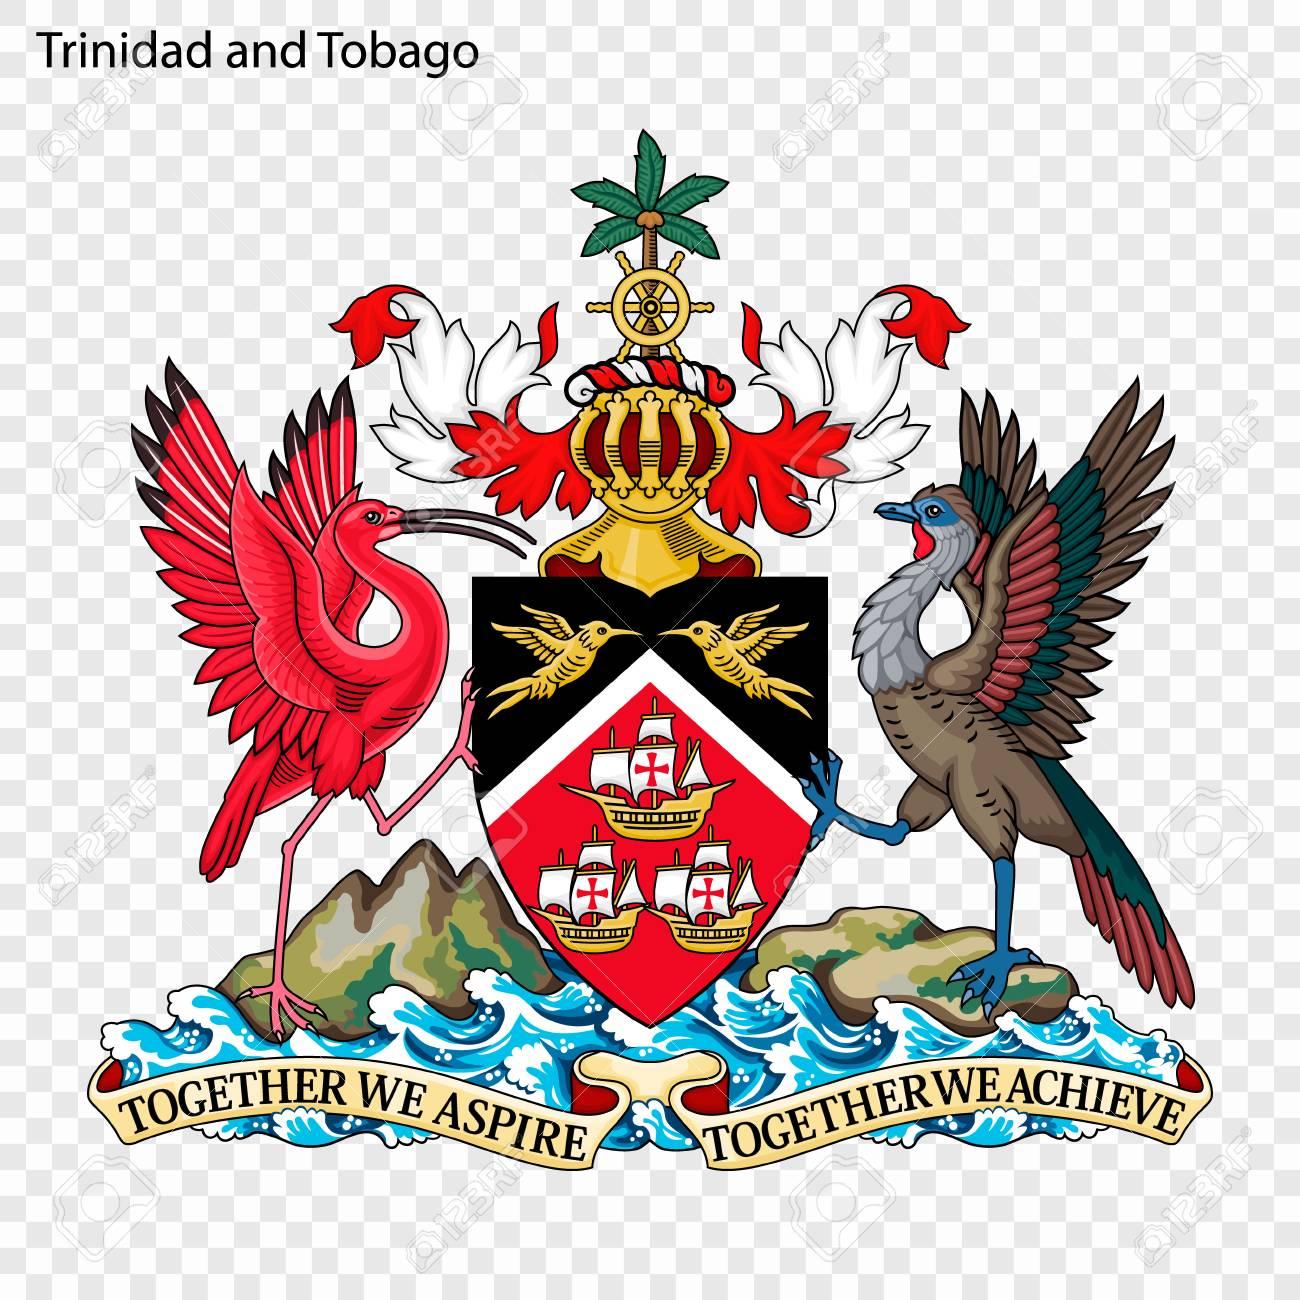 Symbol of Trinidad and Tobago  National emblem